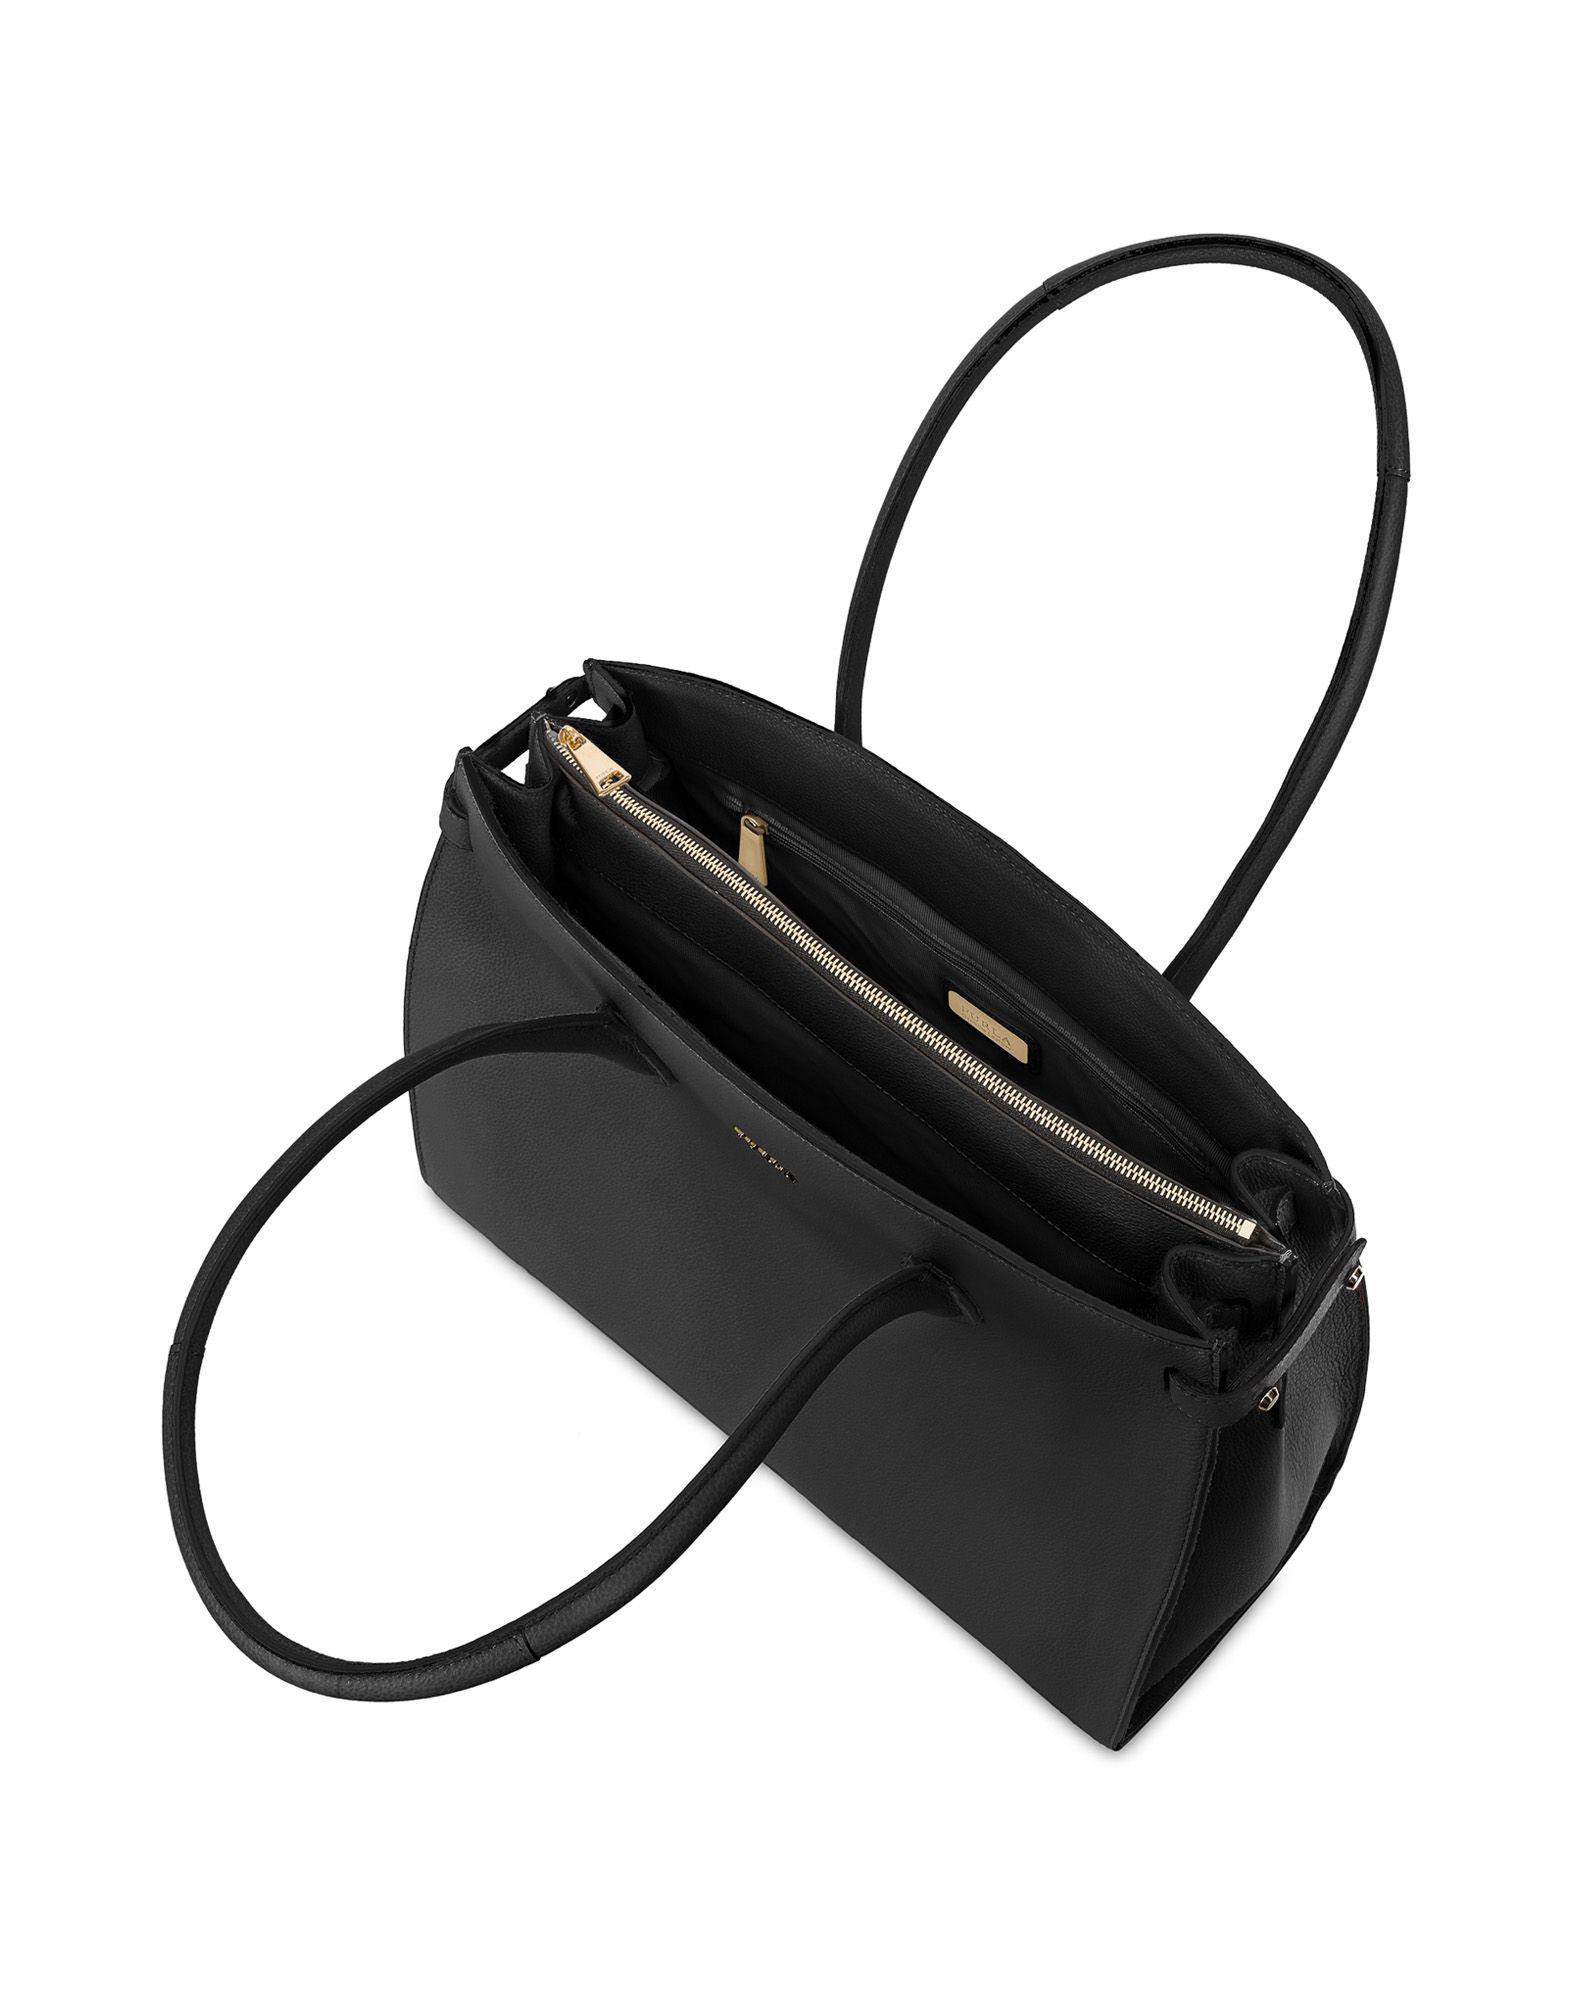 9d0ec2cba24c Lyst - Furla Handbag in Black - Save 30%